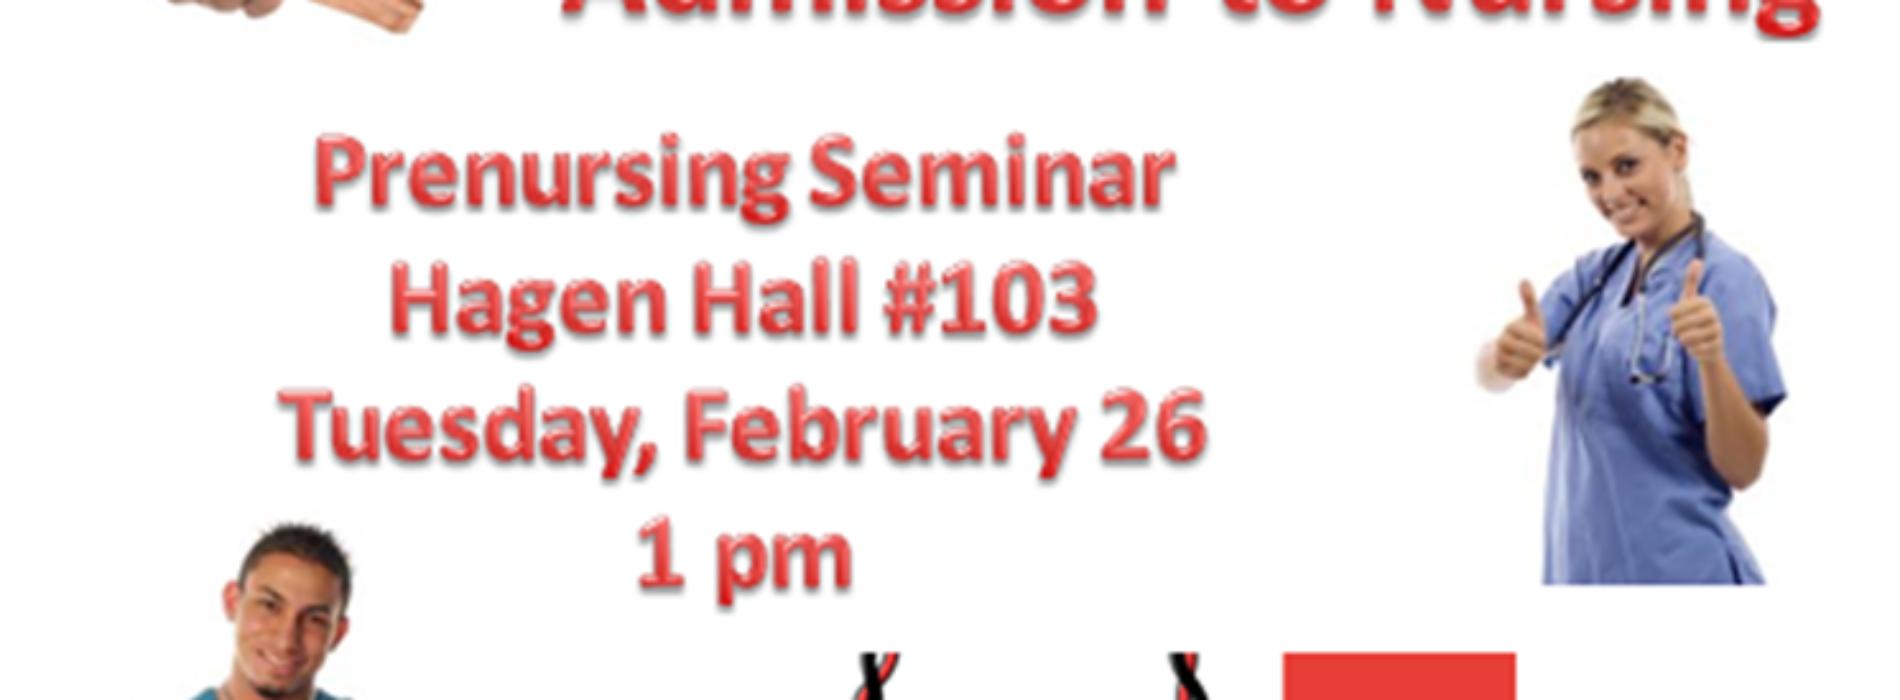 Pre-Nursing Seminar Set for Feb. 26